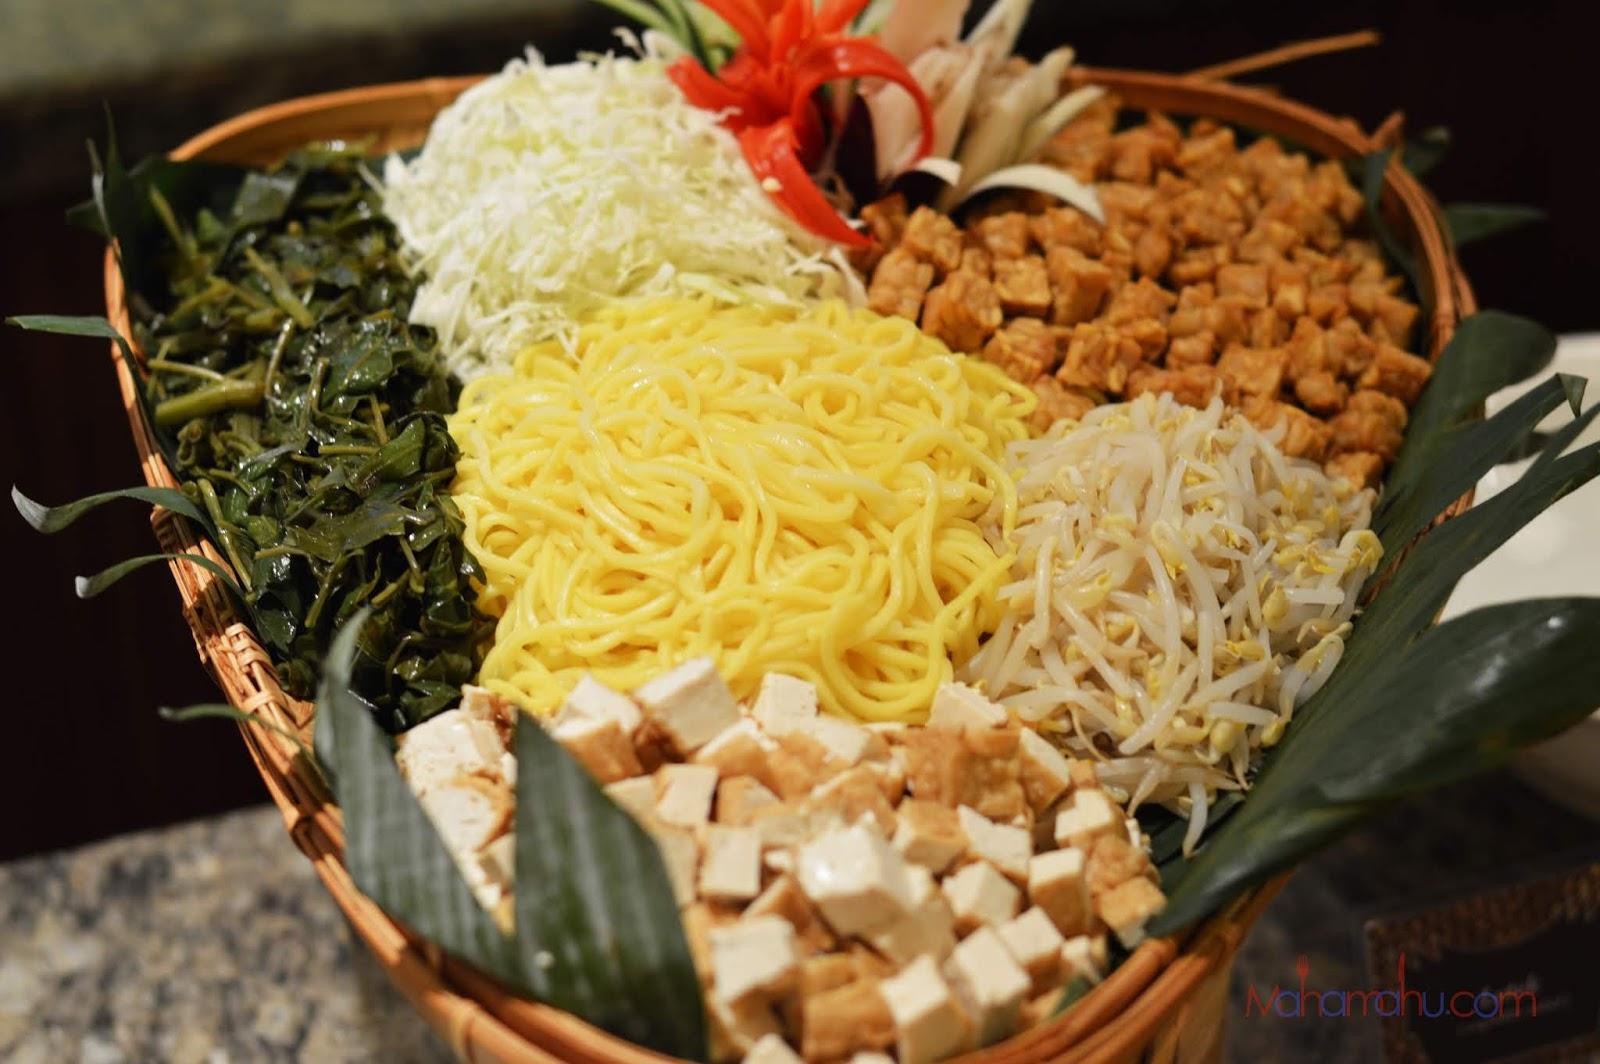 Indonesia Search Date 2018 11 01 Produk Ukm Bumn Jamu Instan Abah Aromahtrenggalek Selepas Makan Mesti Nak Ada Pencuci Mulut Betul Tak Jadi Dalam Bufet Masakan Padang Pun Beberapa Yang Popular Seperti Kolak Pisang Dan